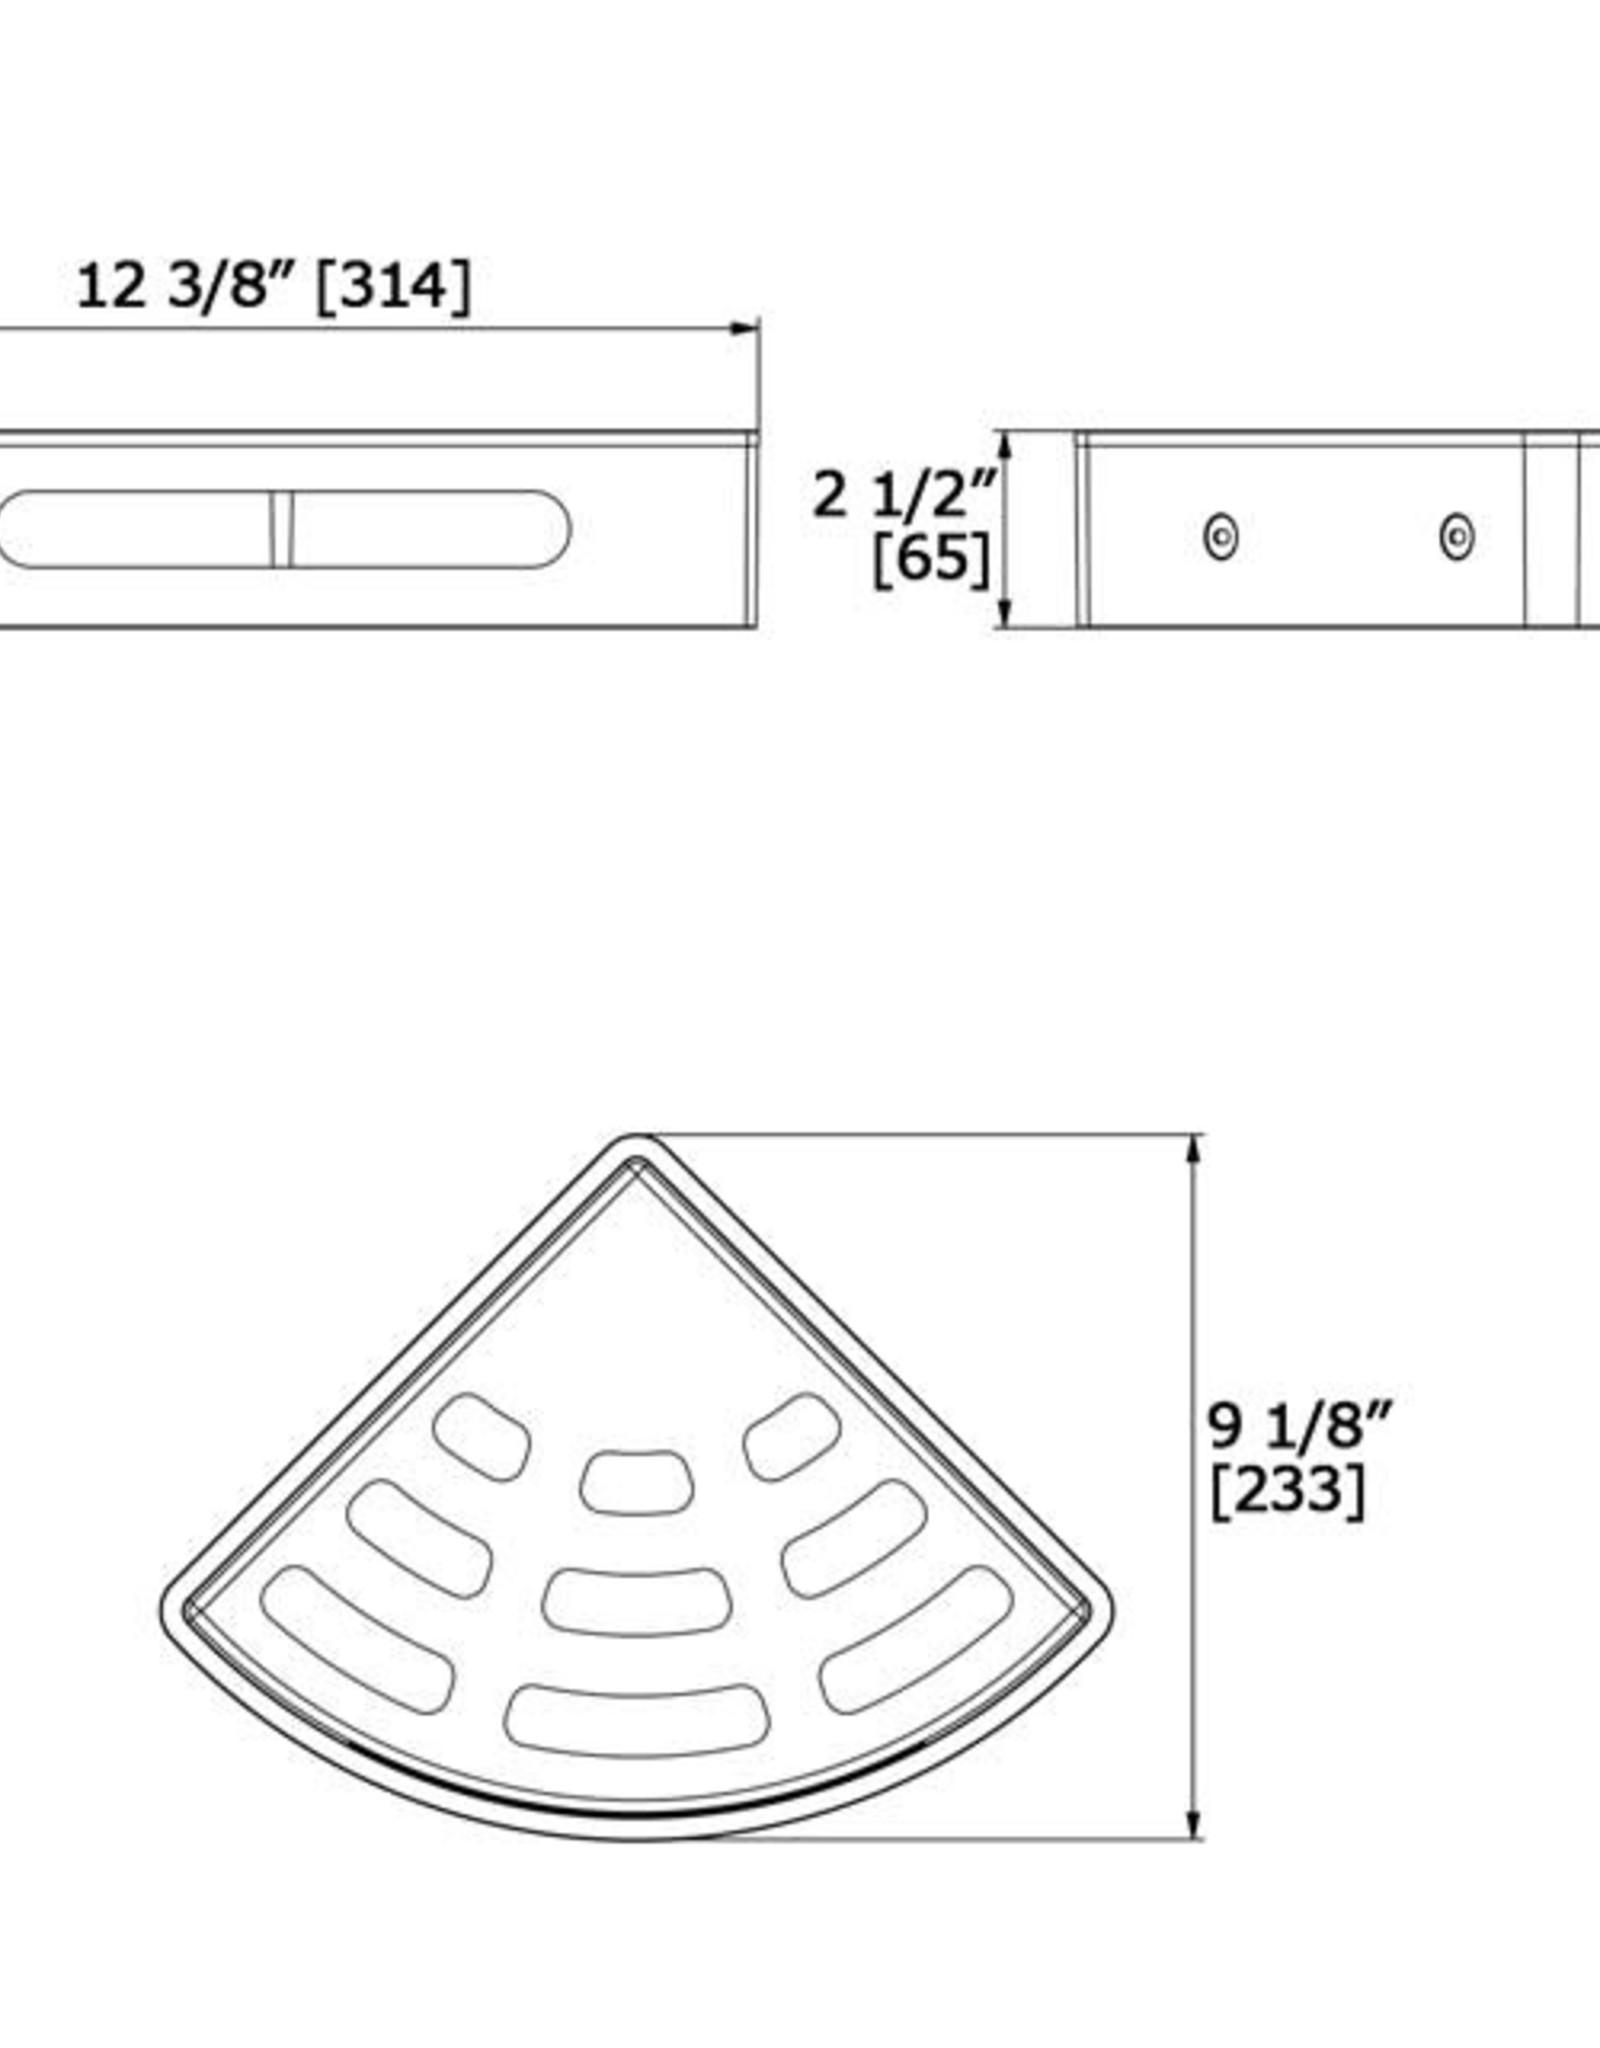 LalOO Laloo Corner Shower Caddy- Removable Inner Basket